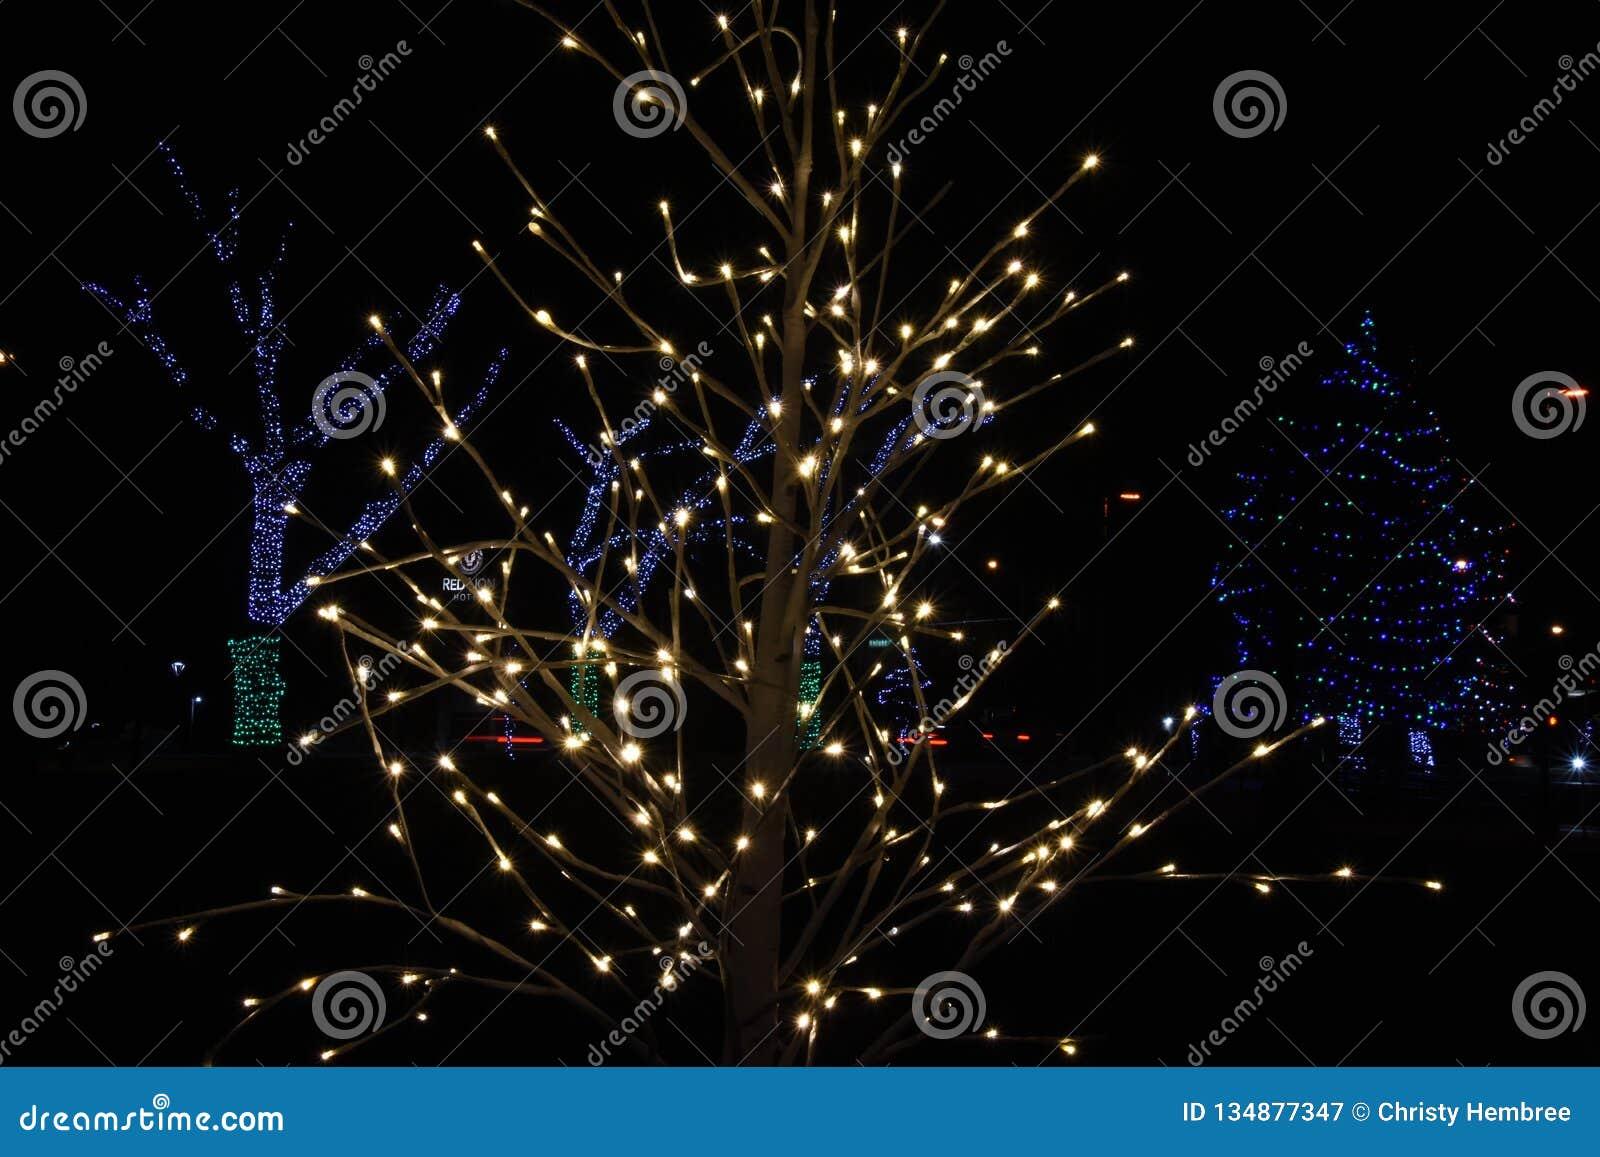 O Christmas Tree: Lights at John Dam Plaza brighten holidays